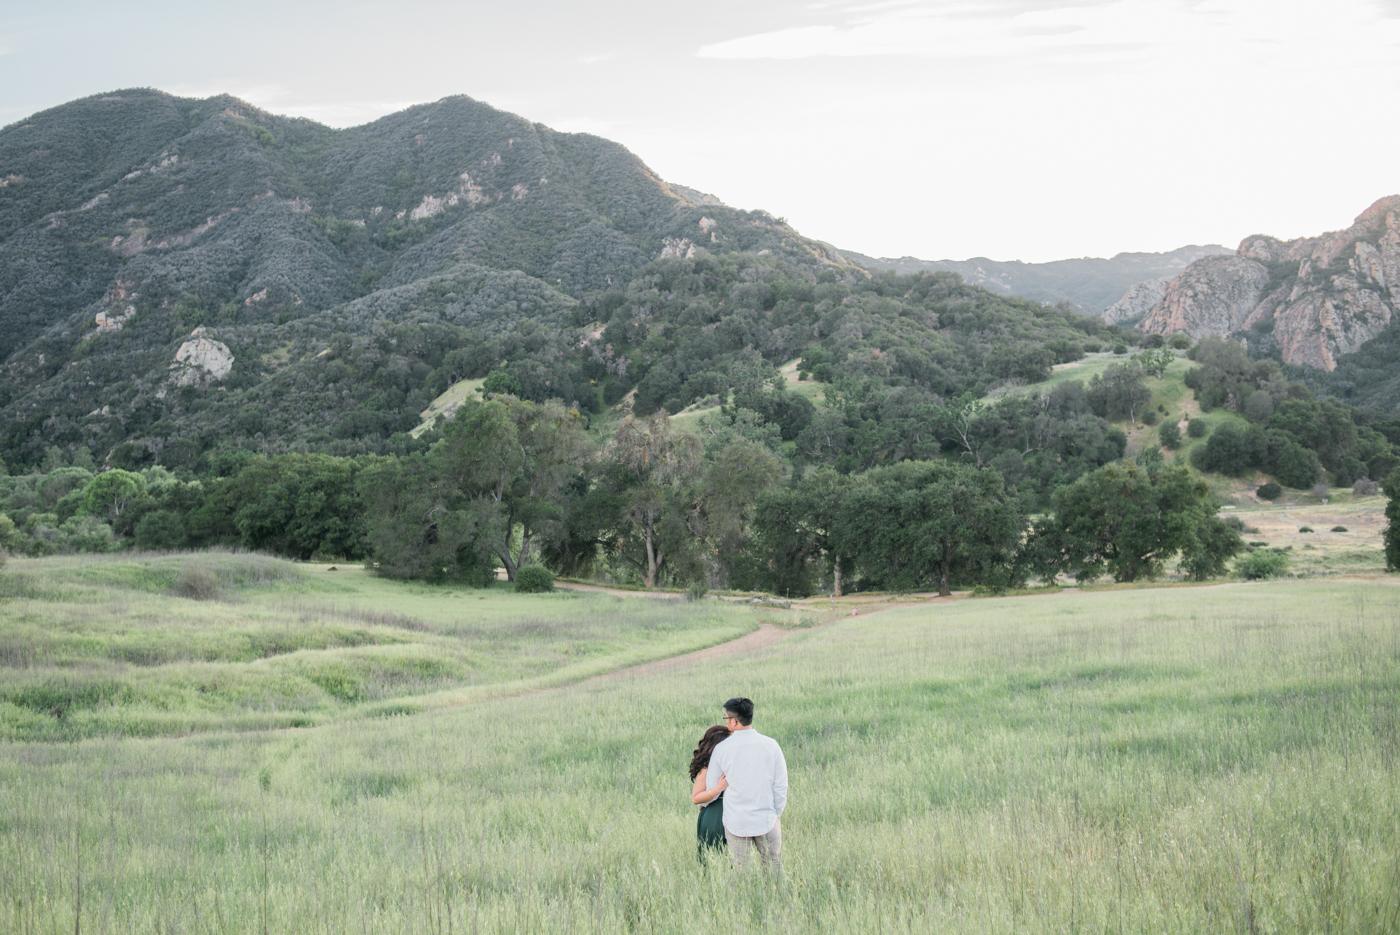 dianne&christian-malibu-creek-state-park-engagement-session-photography-los-angeles-based-wedding-photographer-17.jpg